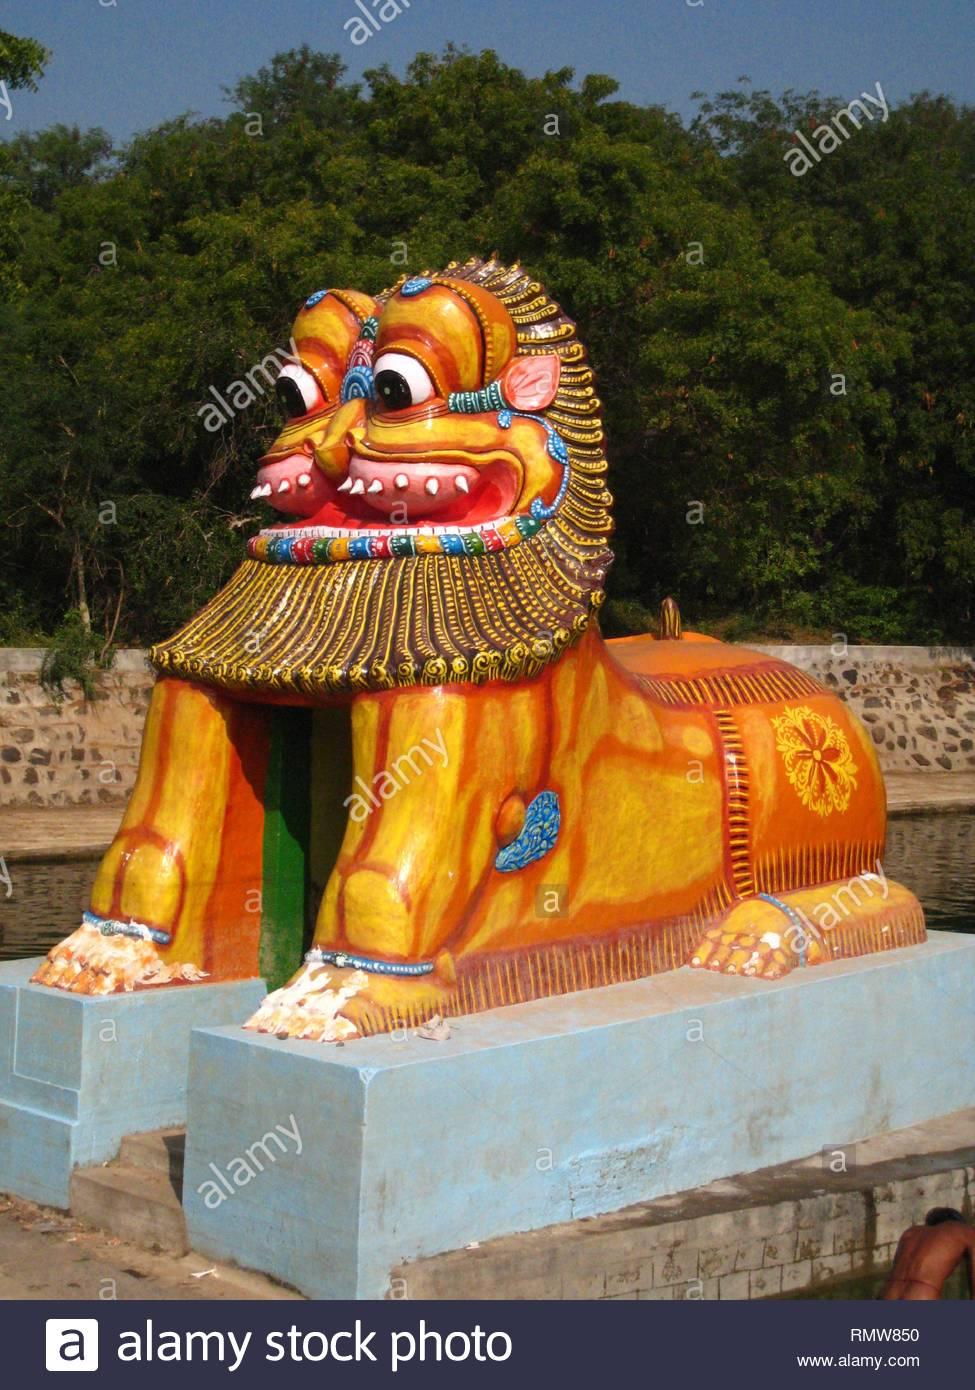 Simha Theertham statue, Tiruvannamalai, Tamil Nadu, India, Asia - Stock Image